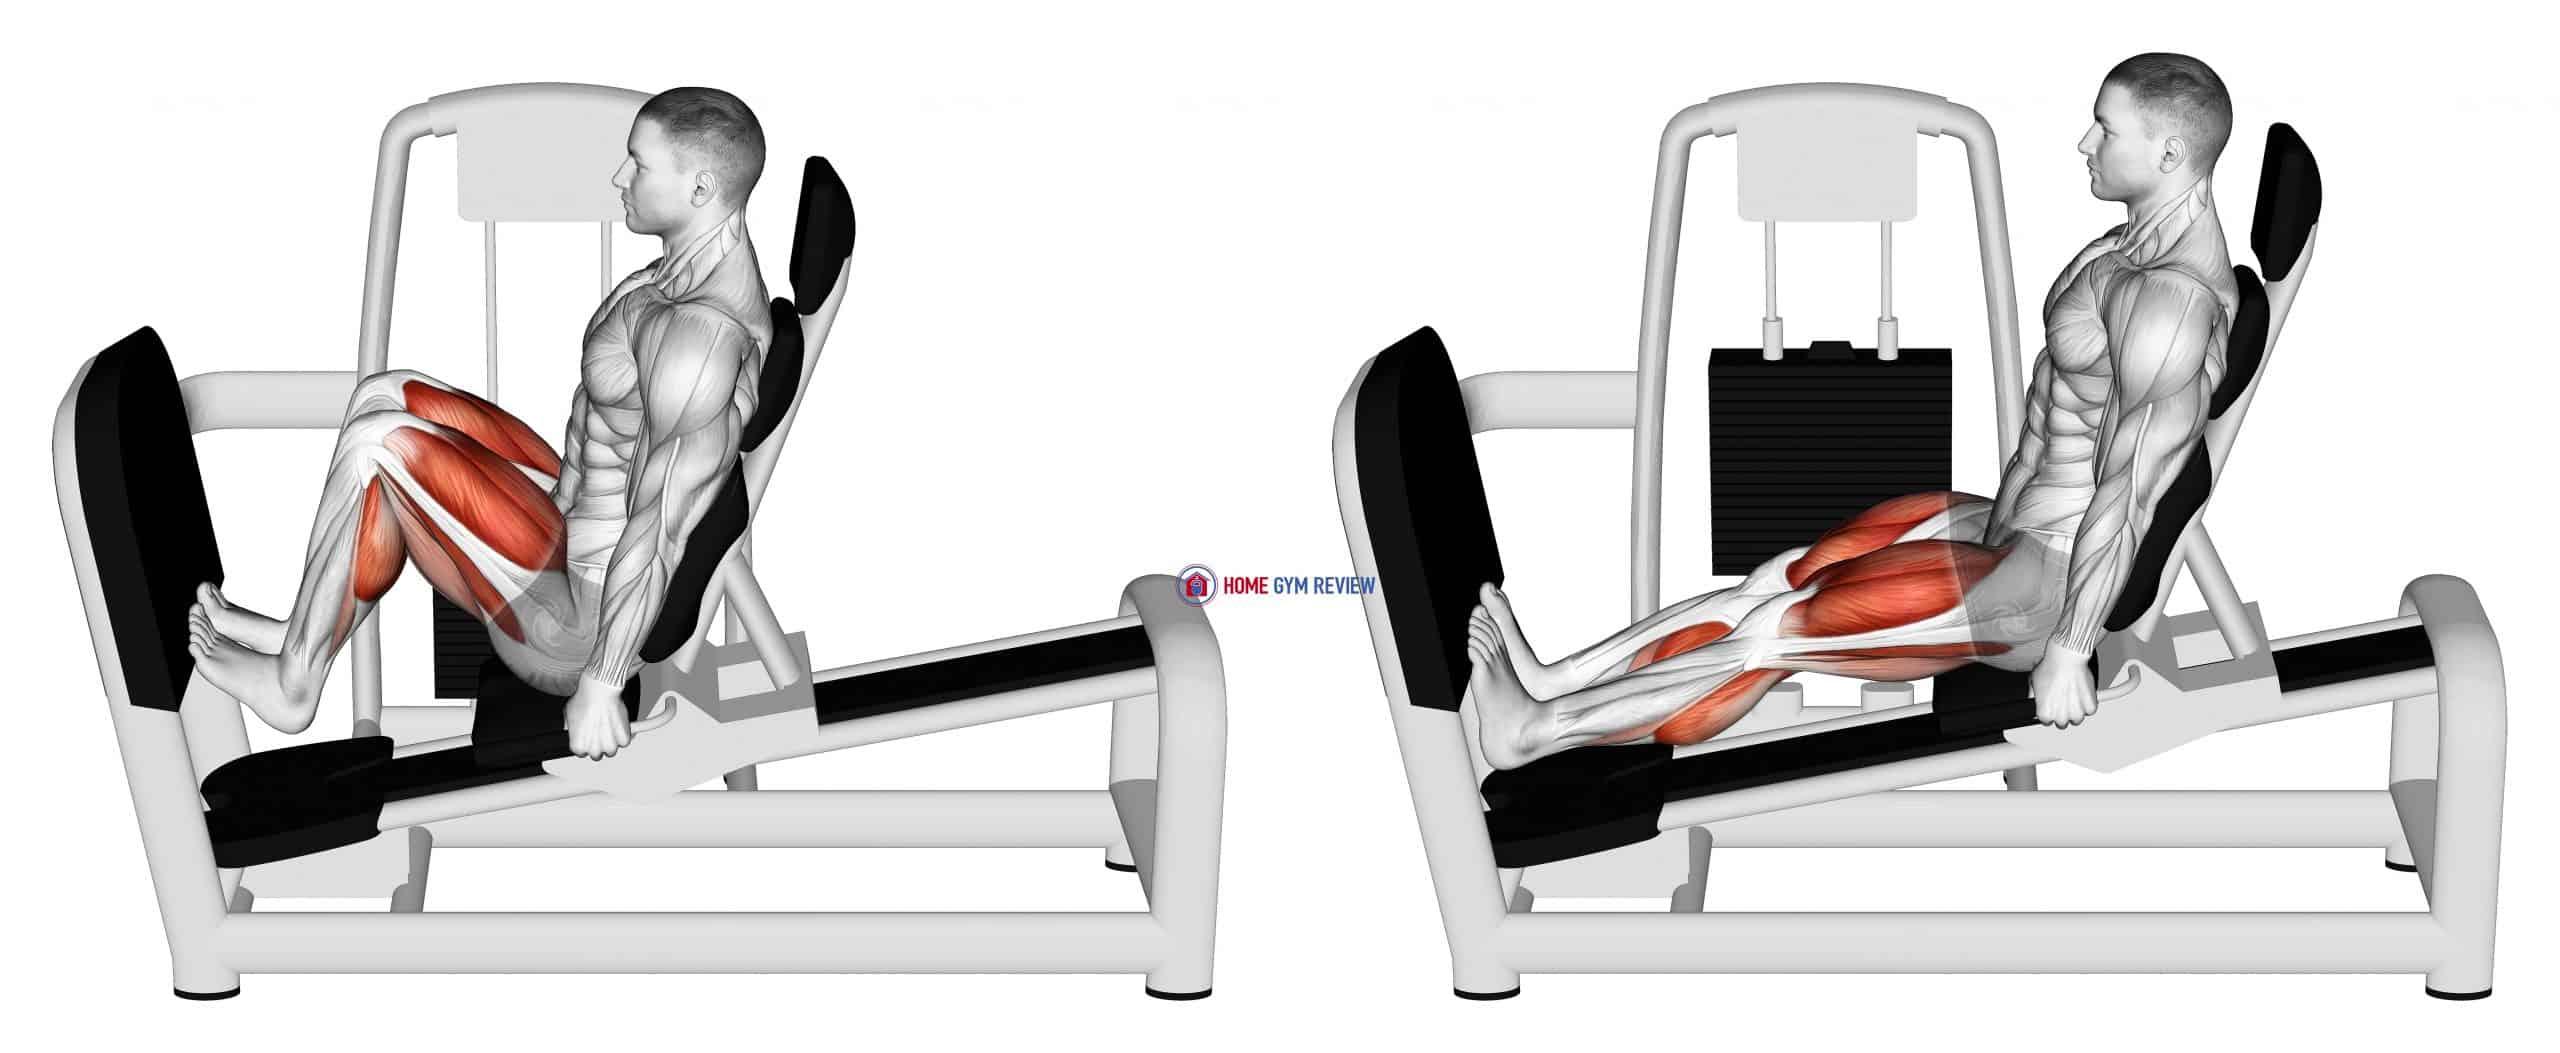 Lever Seated Squat Calf Raise on Leg Press Machine